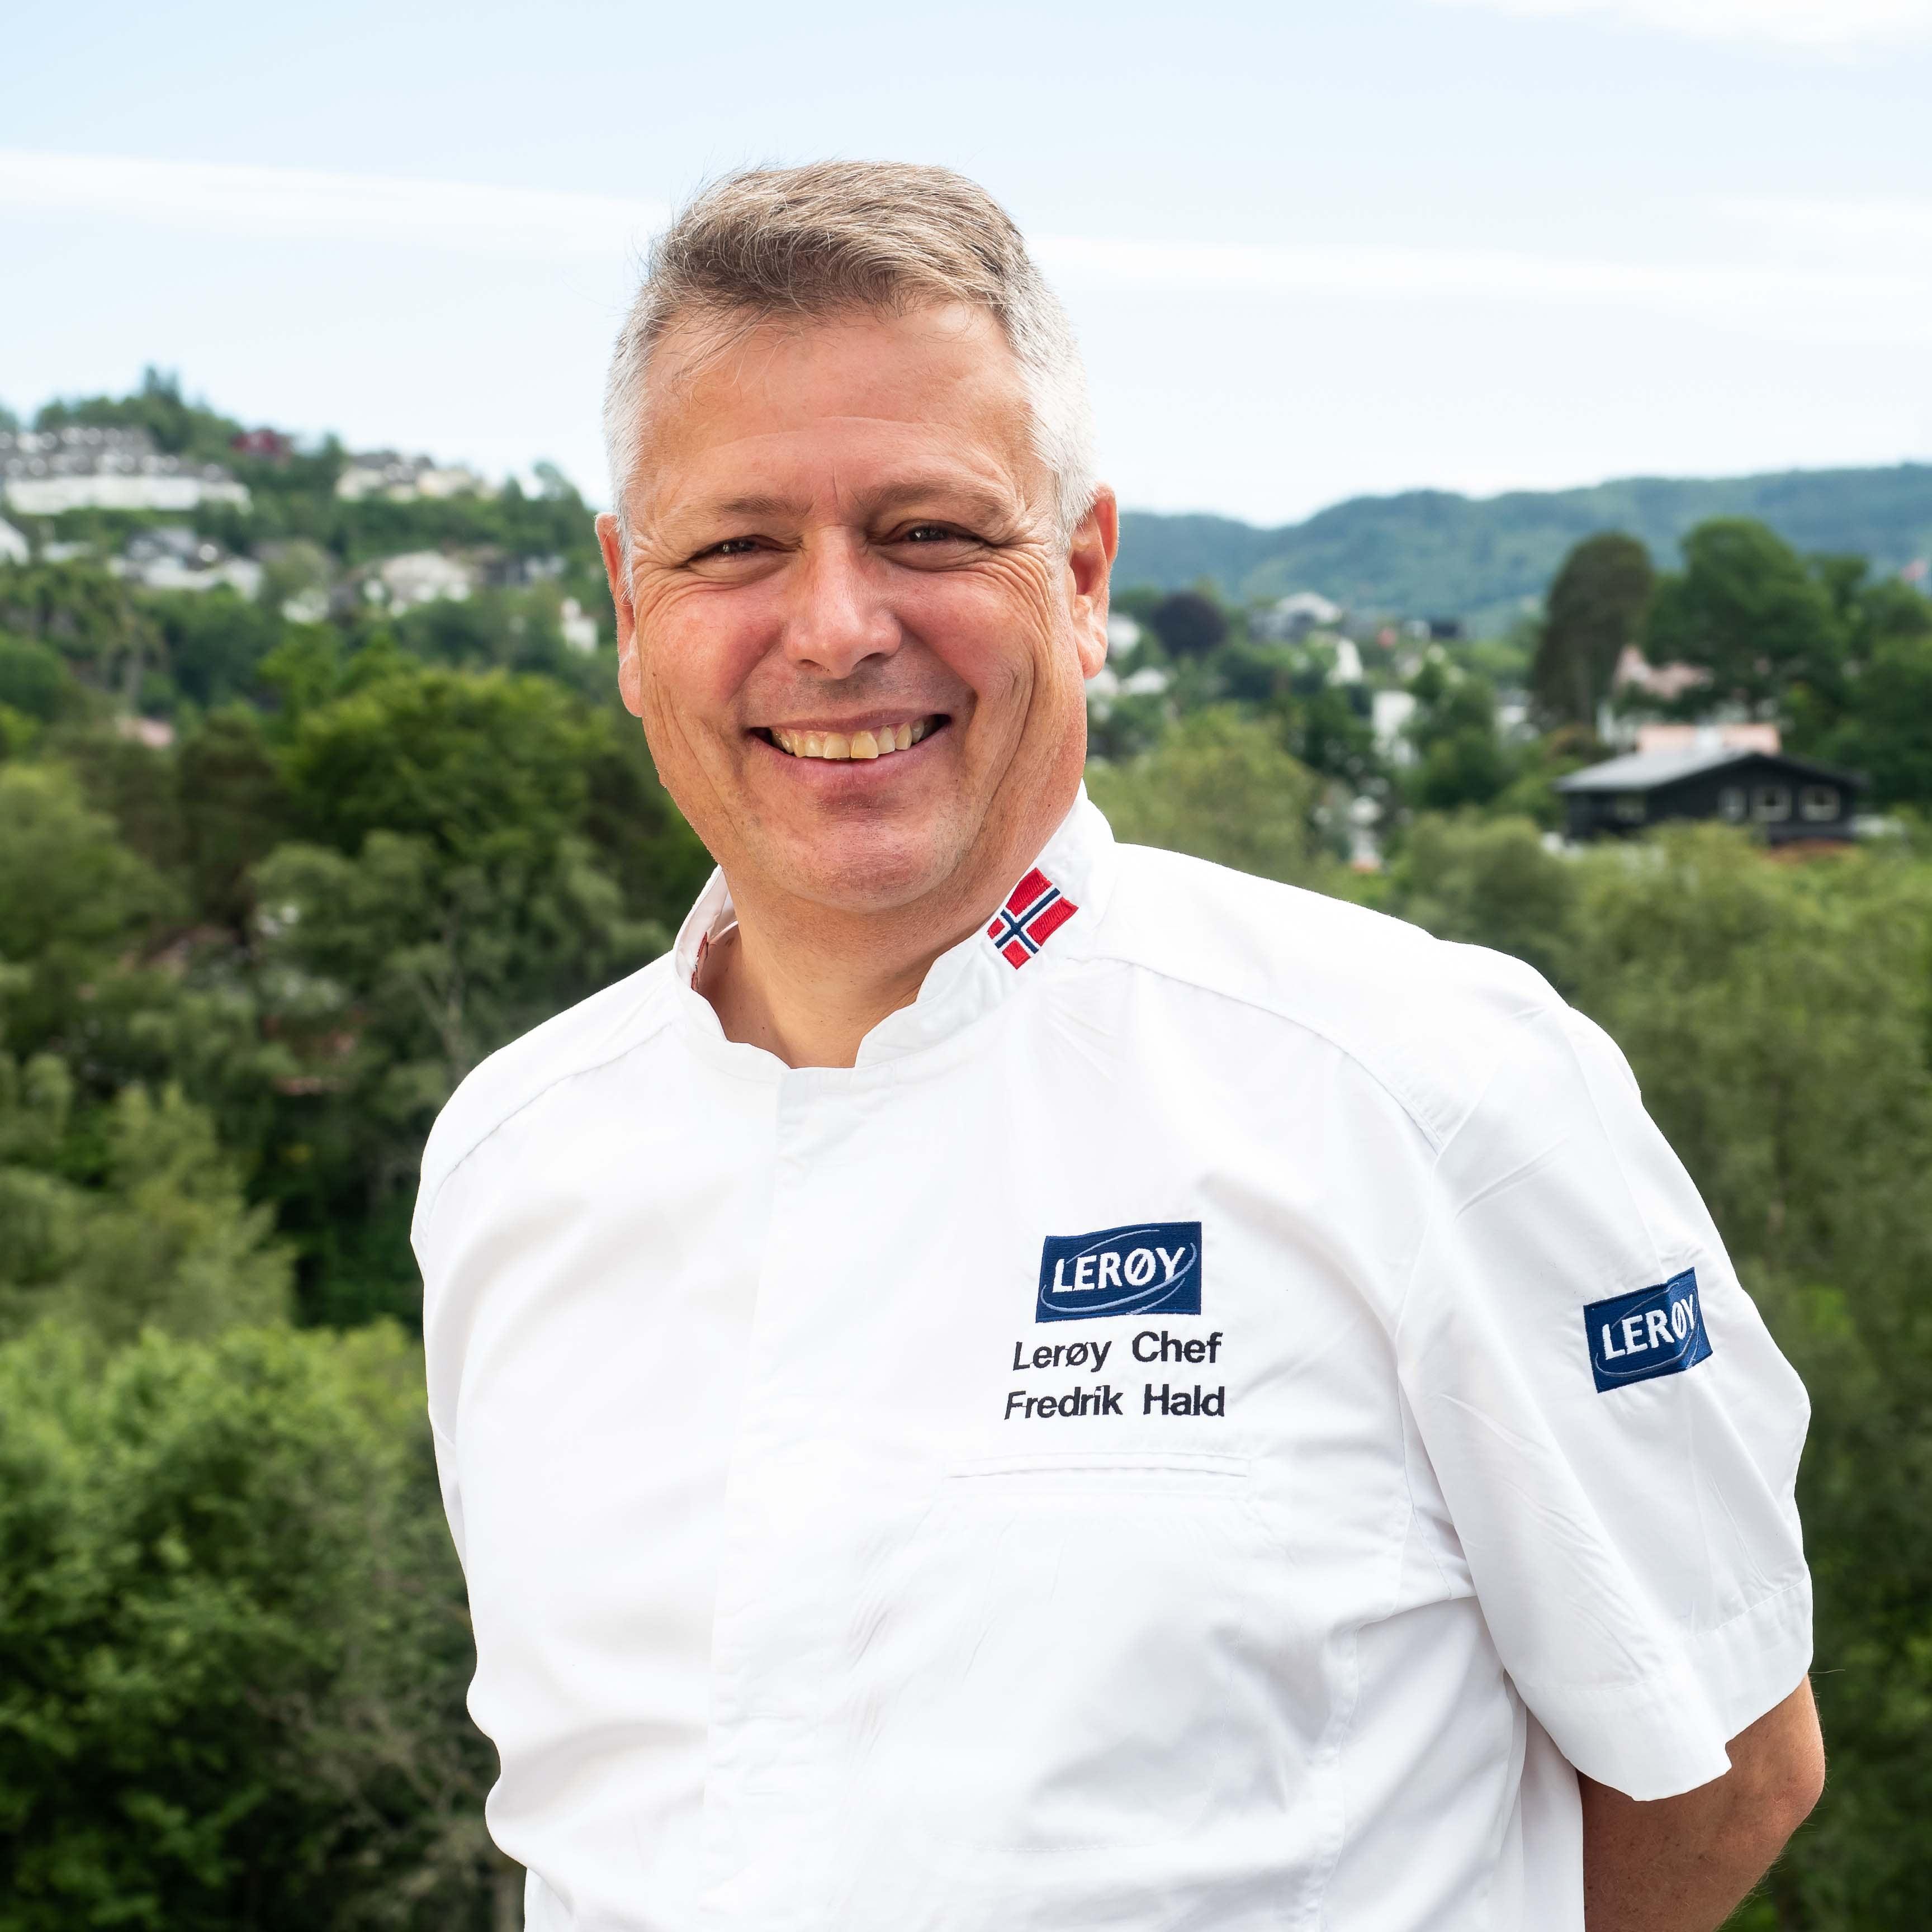 Fredrik Hald